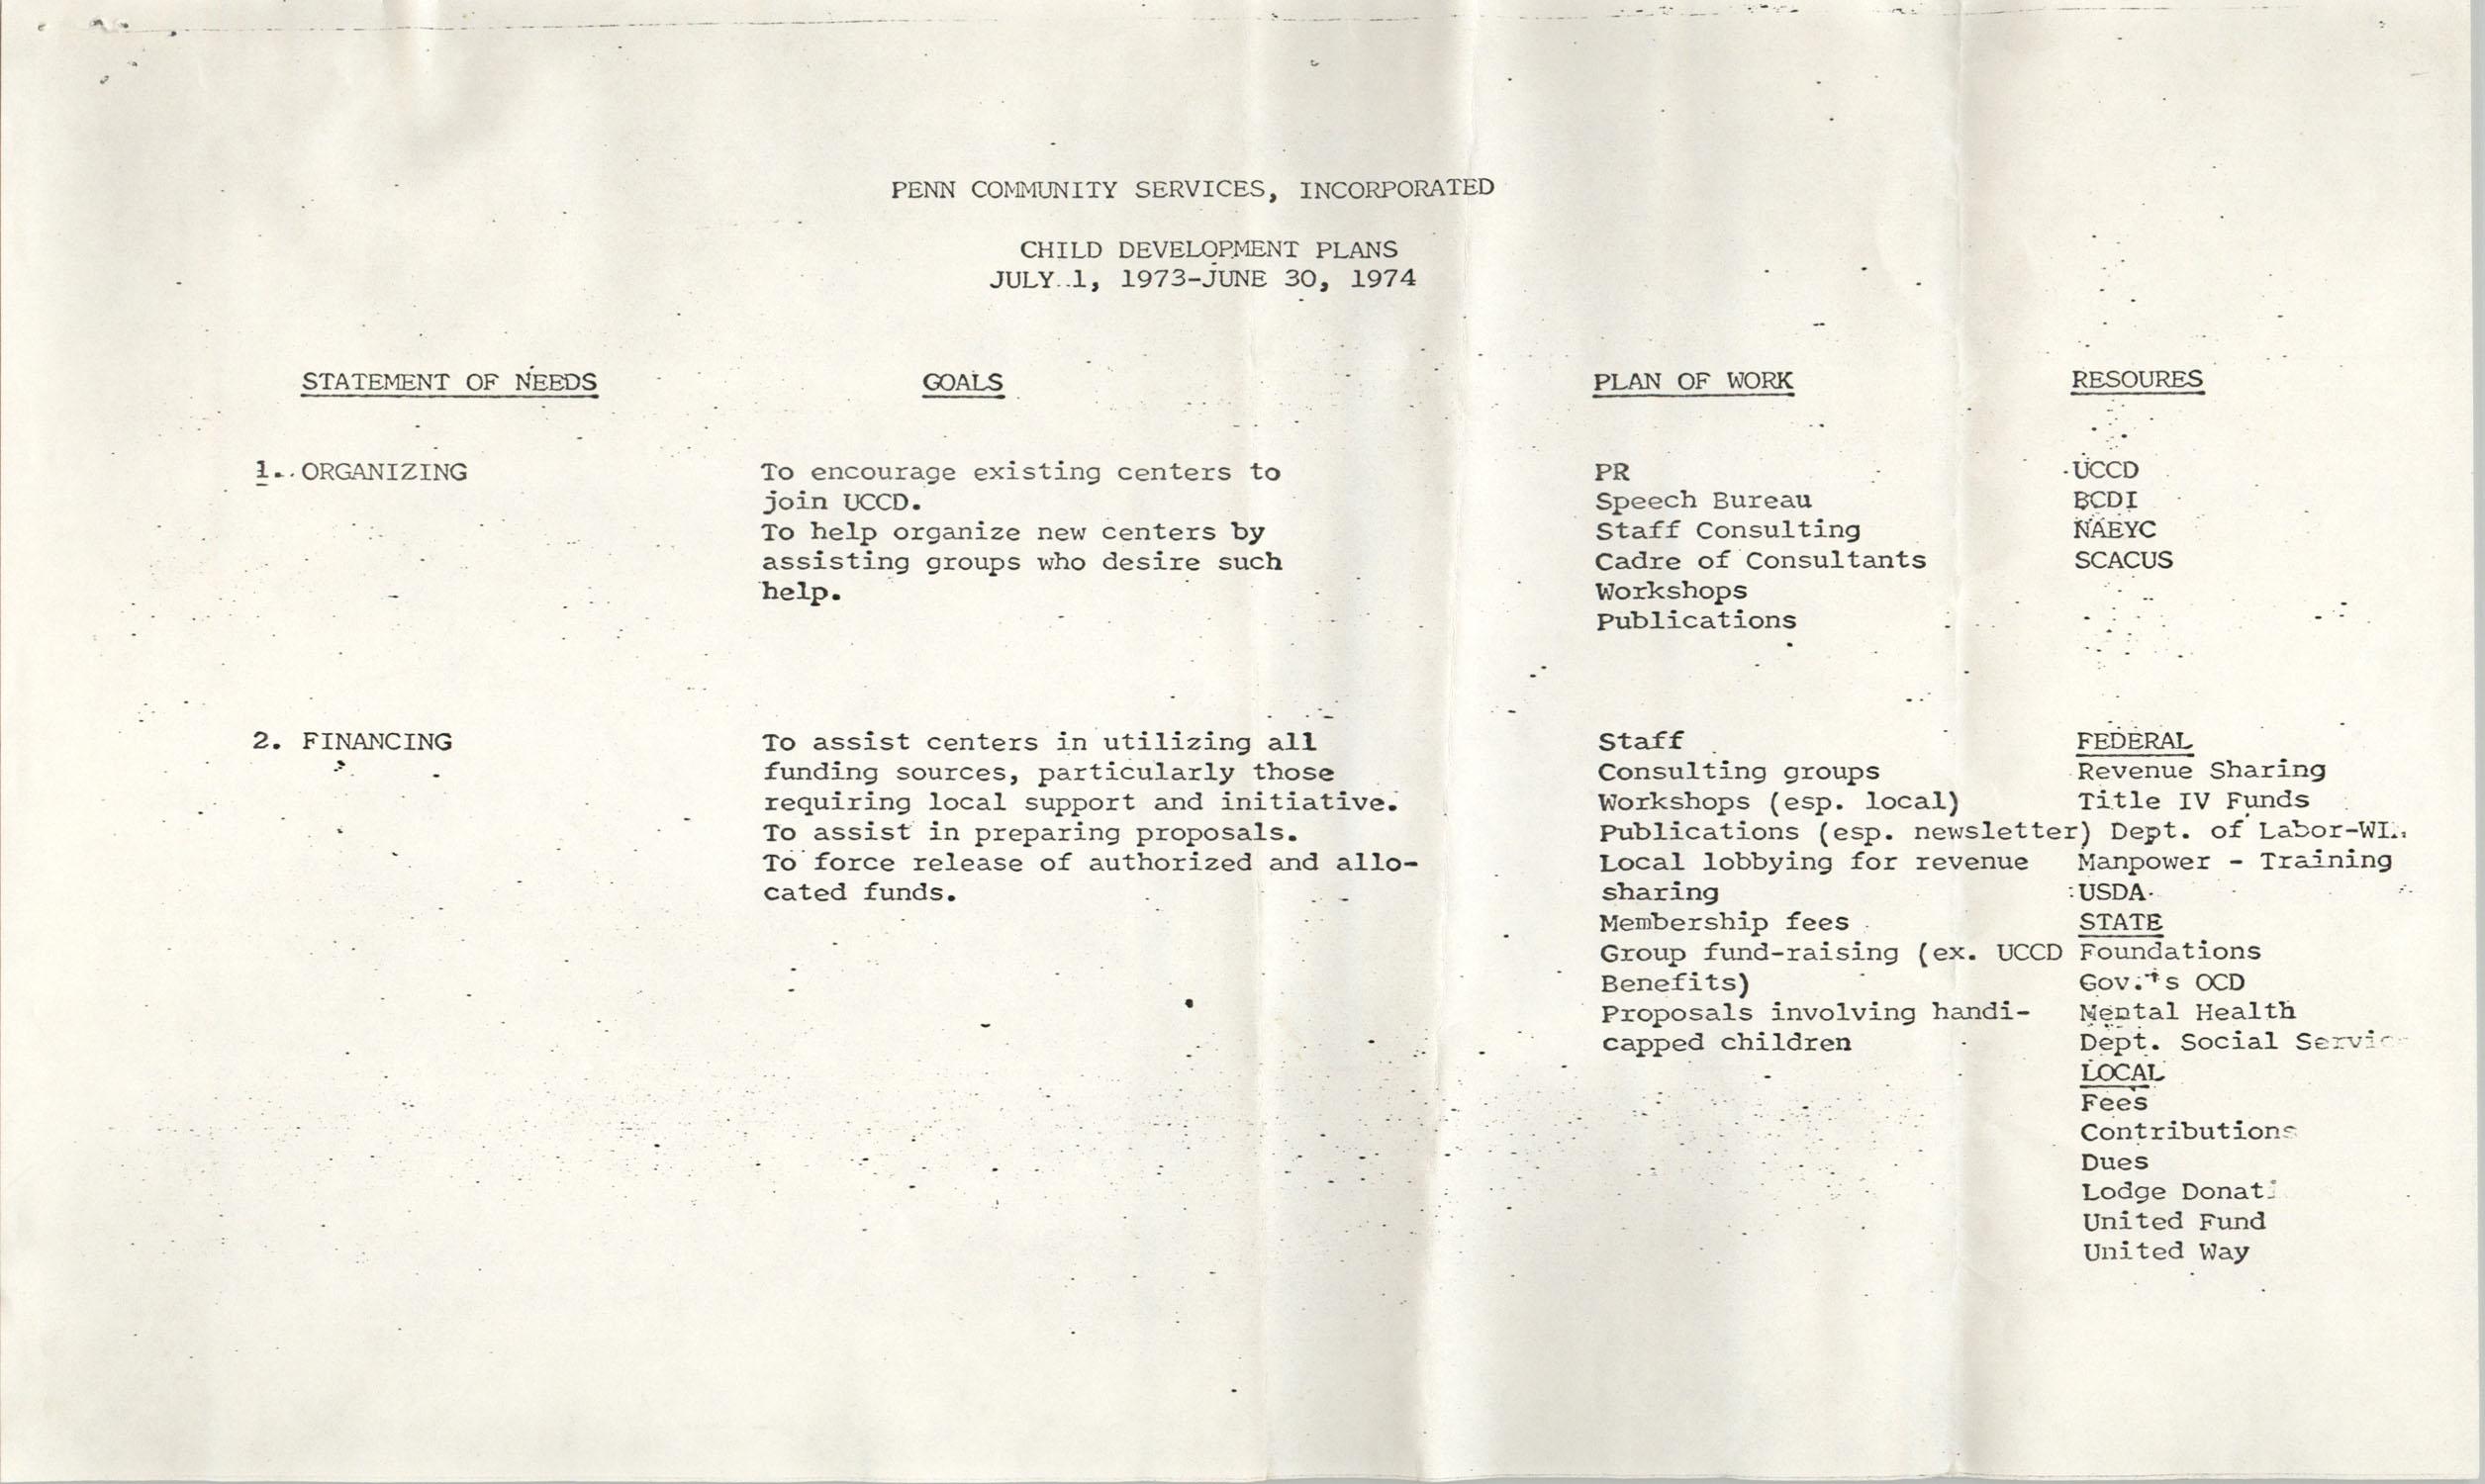 Child Development Plans, Penn Community Services, July 1, 1973 to June 30, 1974